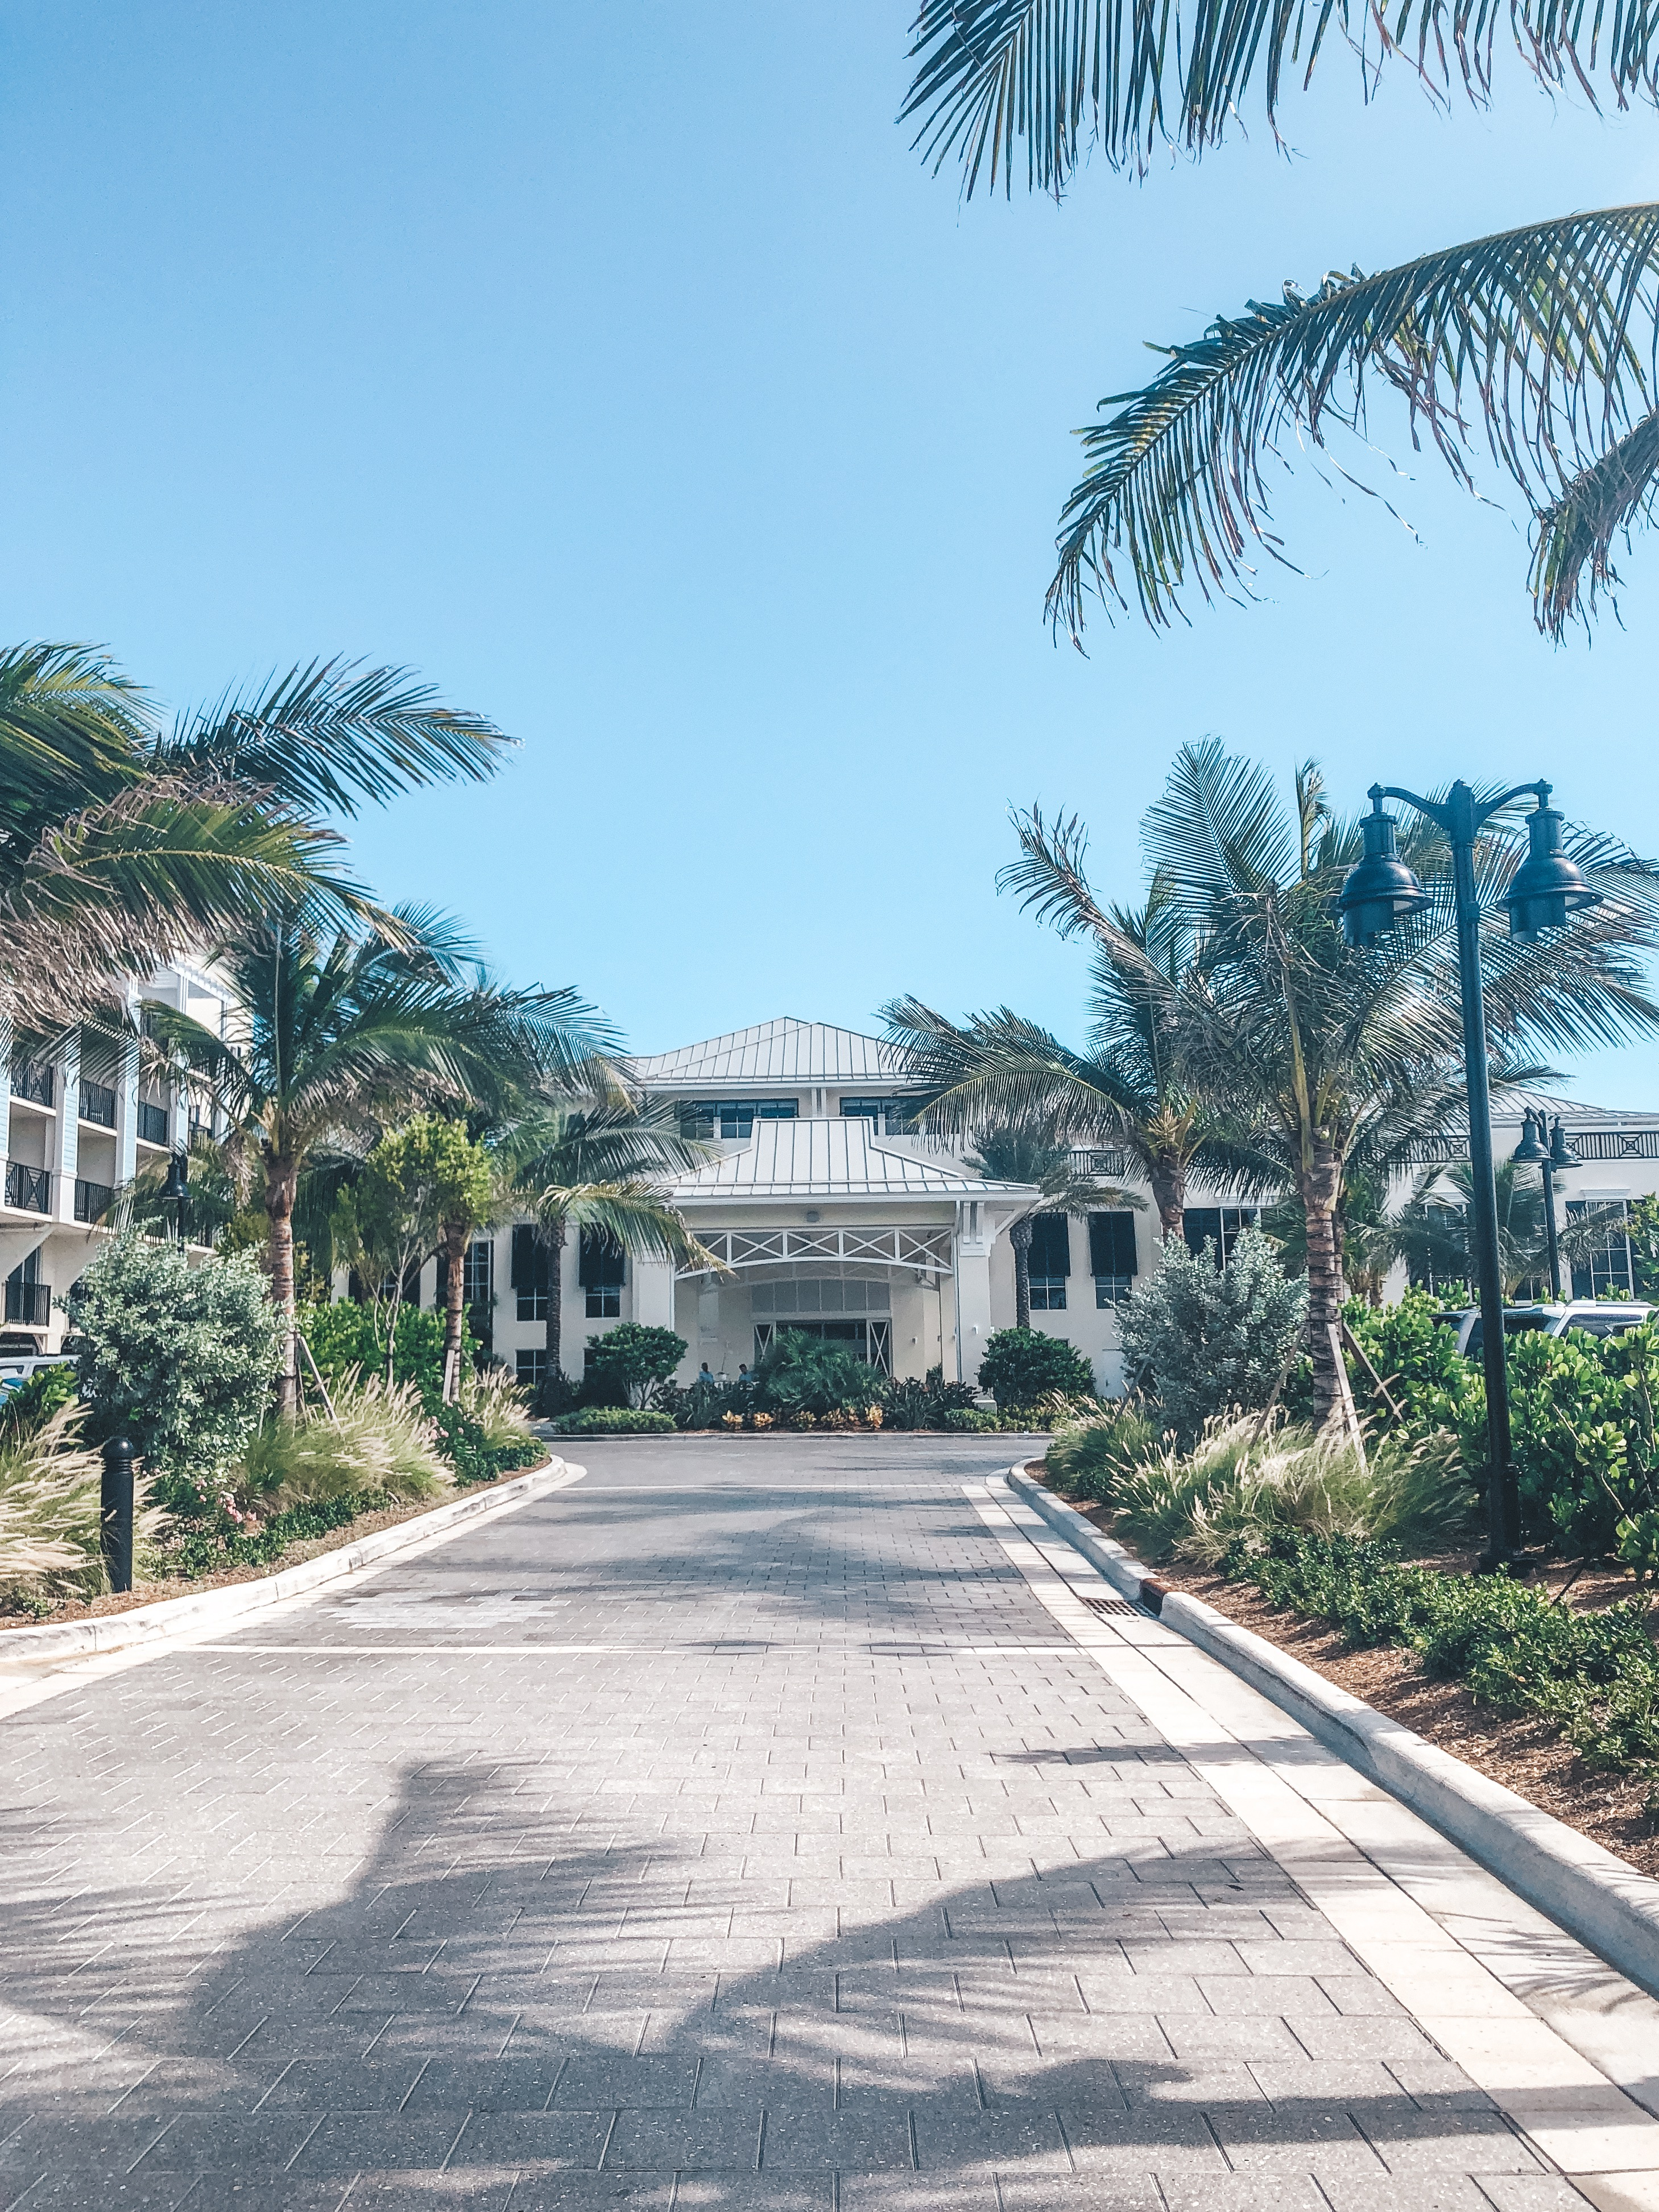 Hutchinson Shores - 30A Mama Travel - Hotel on Hutchinson Island